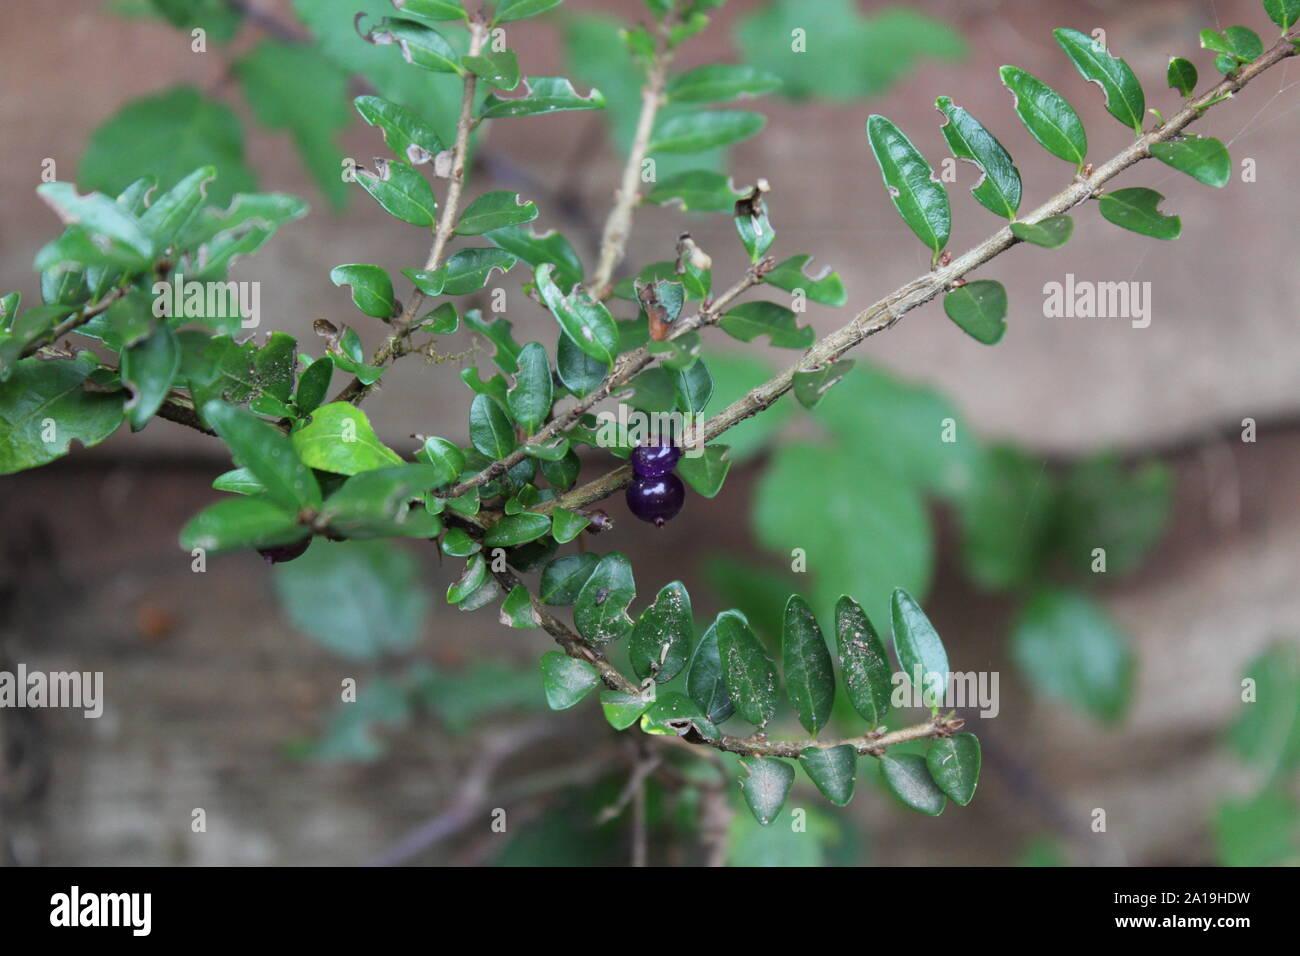 Garden Shrub With Purple Berries Stock Photos Garden Shrub With